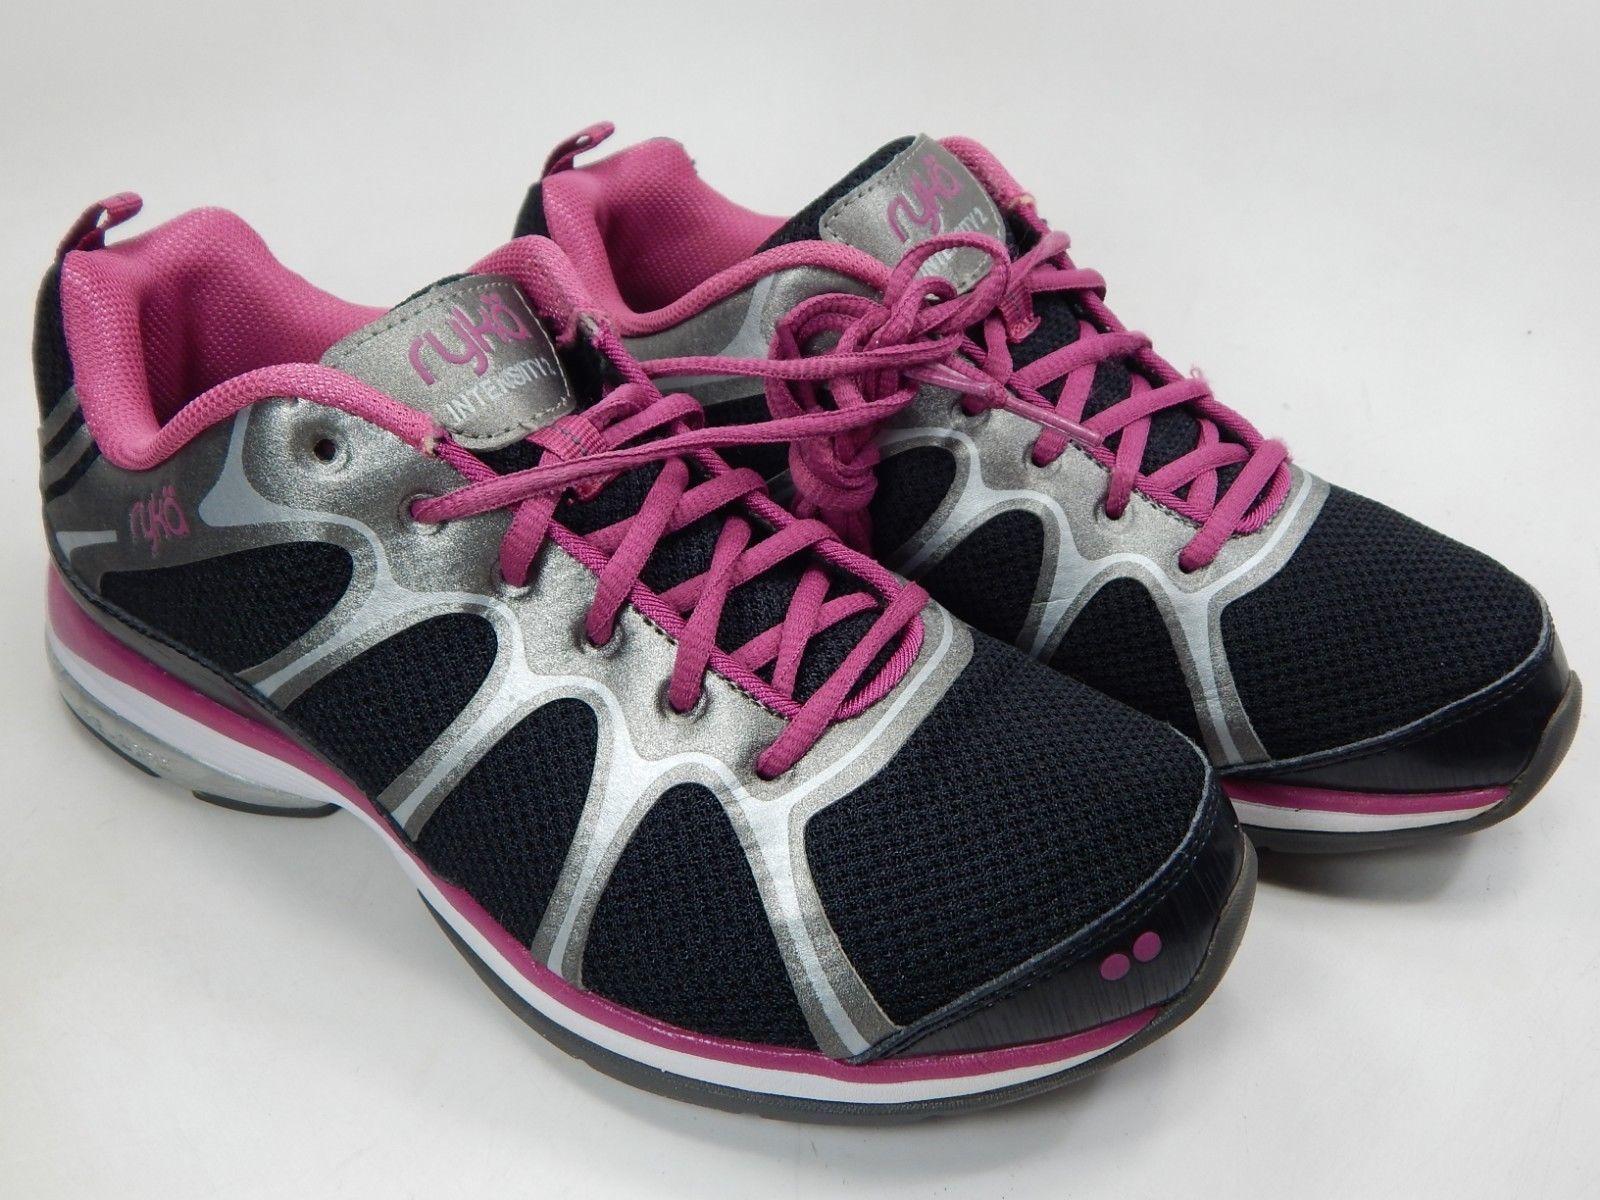 Ryka Intensity 2 US 8 M (B) EU 39 Women's Running Shoes Black Purple